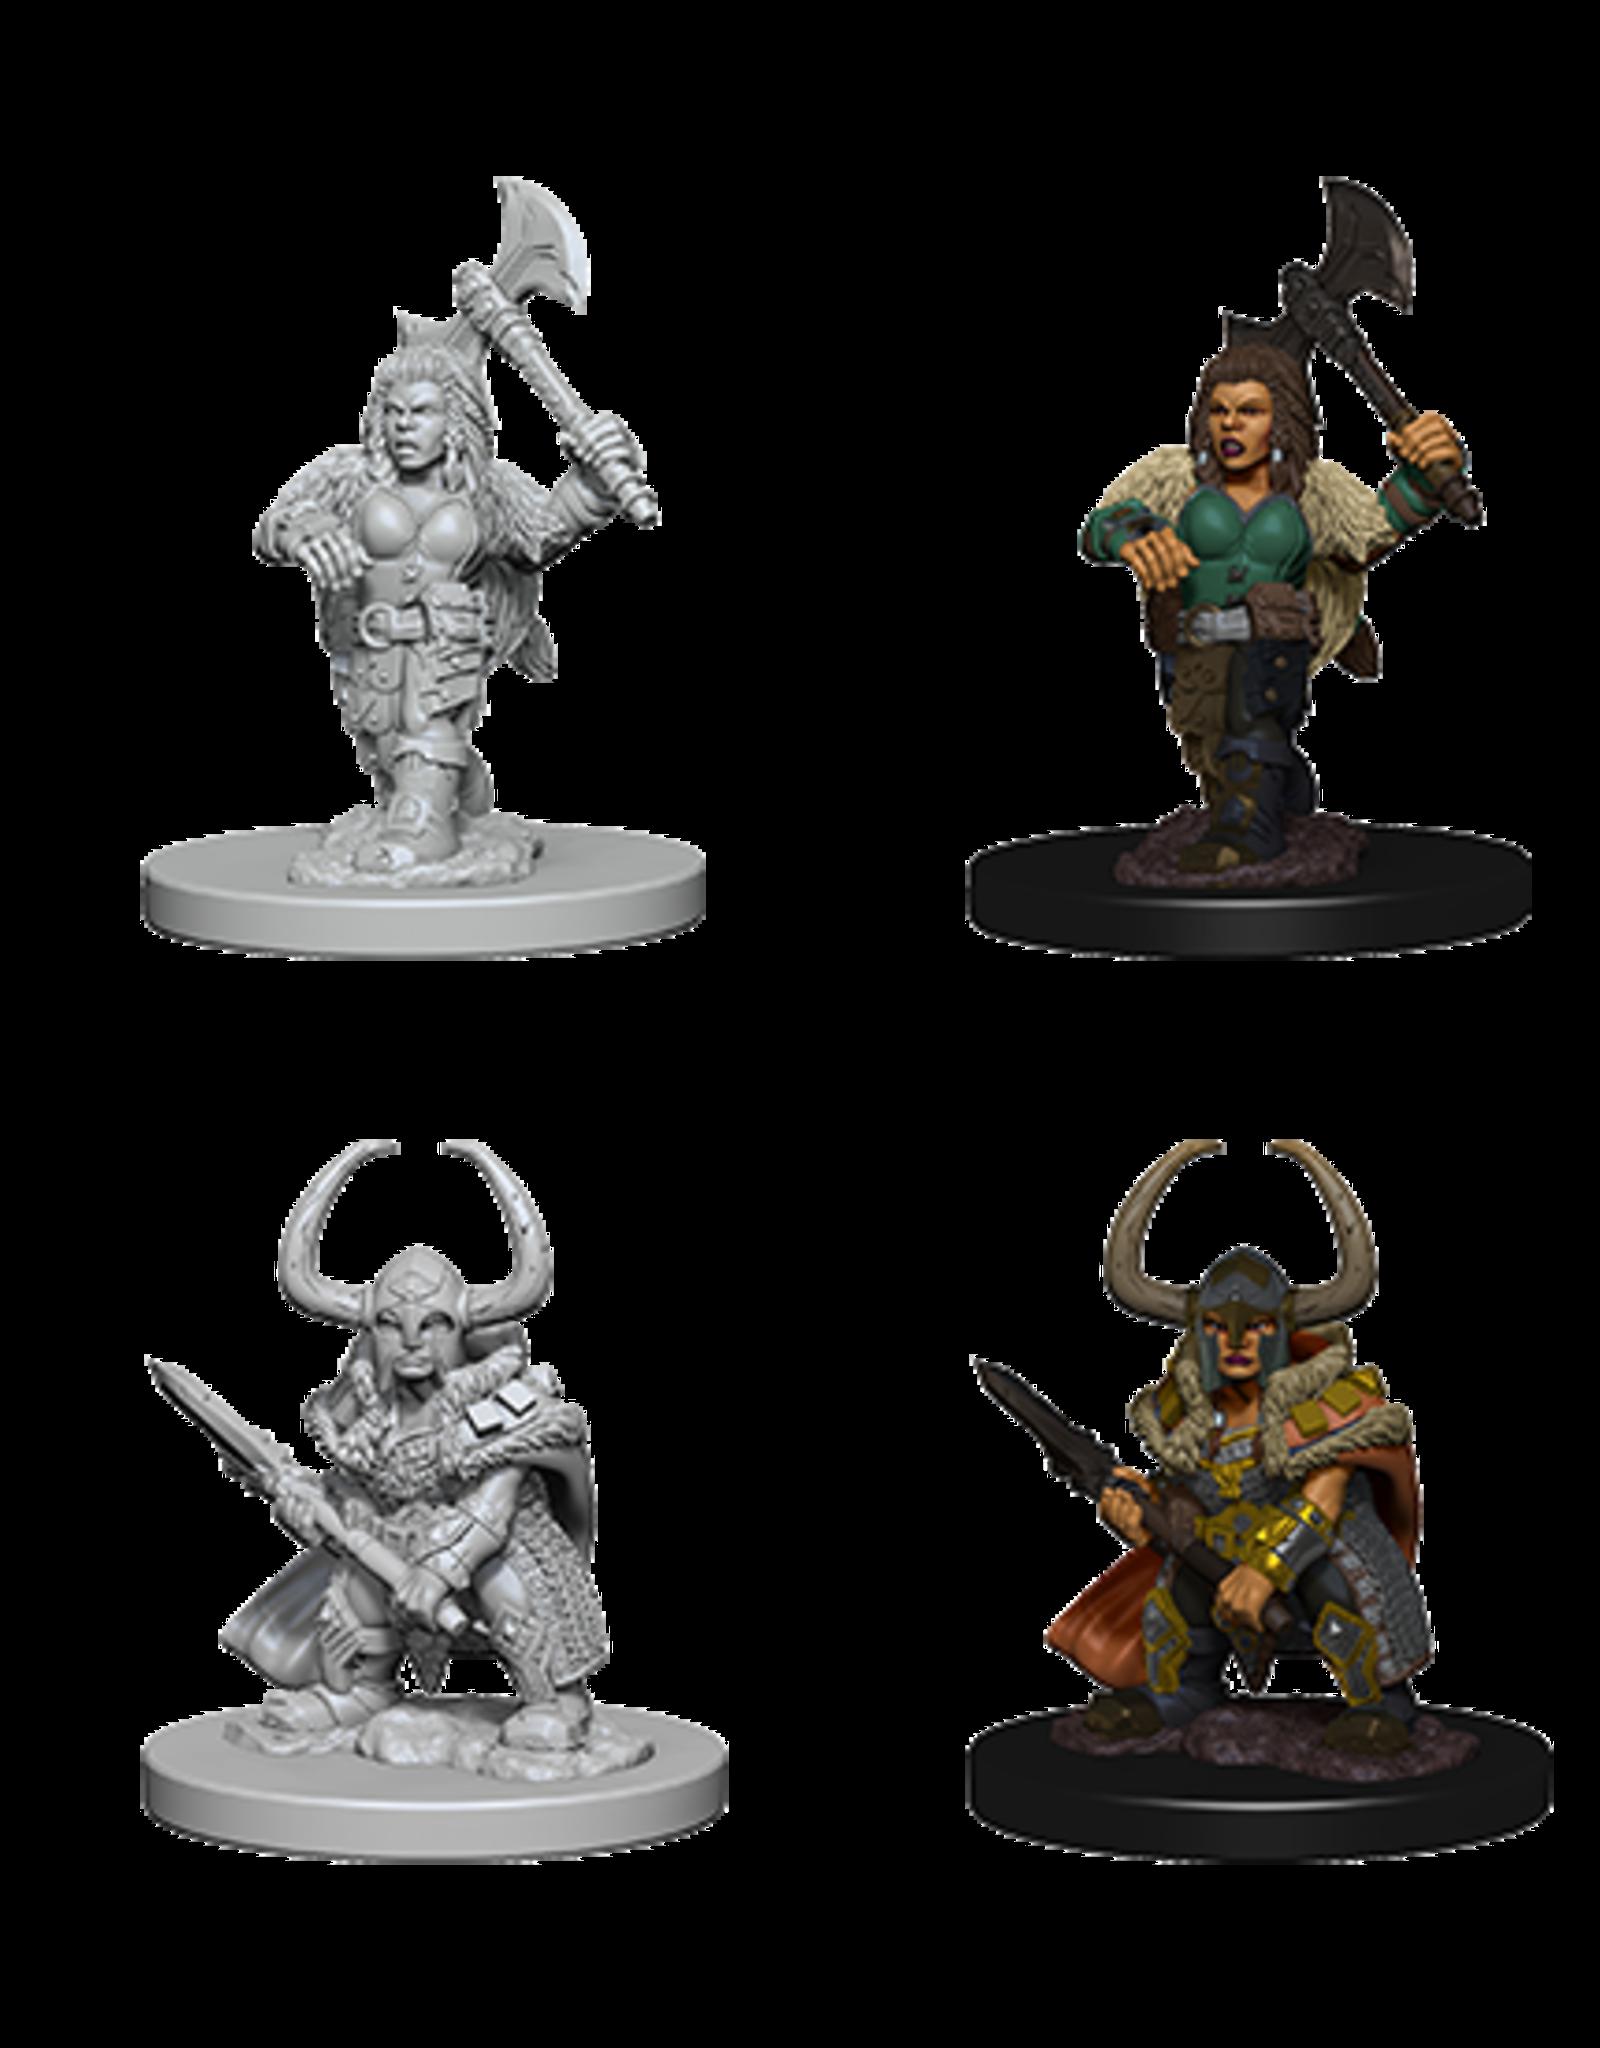 Dungeons & Dragons D&D NMU - Dwarf Barbarian Female